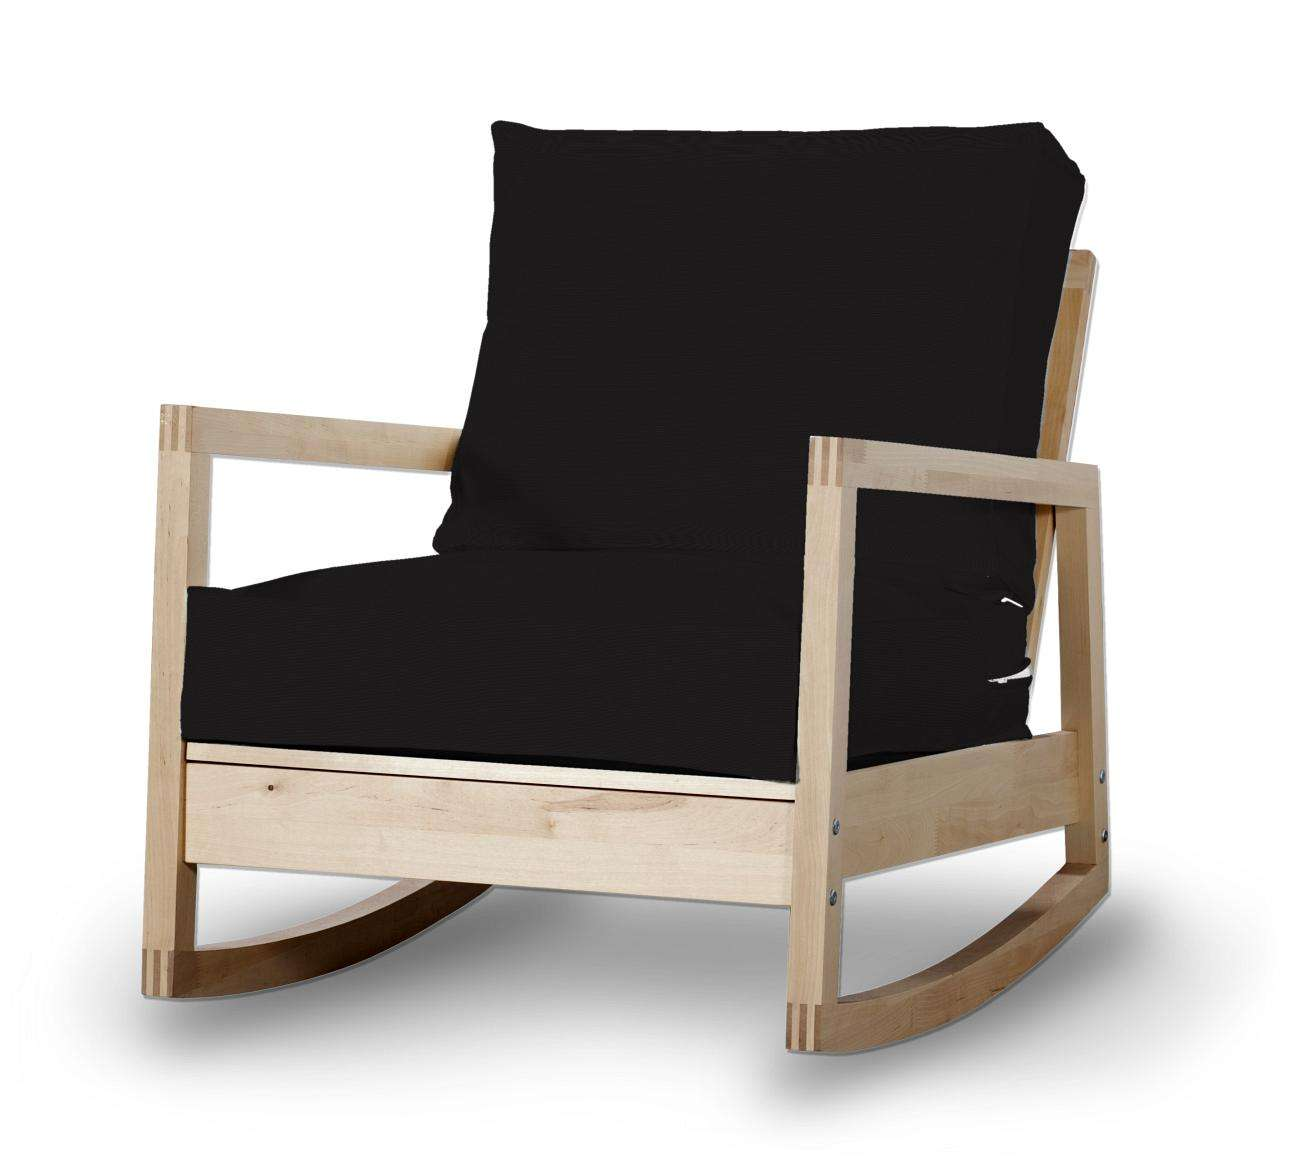 Pokrowiec na fotel Lillberg Fotel Lillberg w kolekcji Cotton Panama, tkanina: 702-09